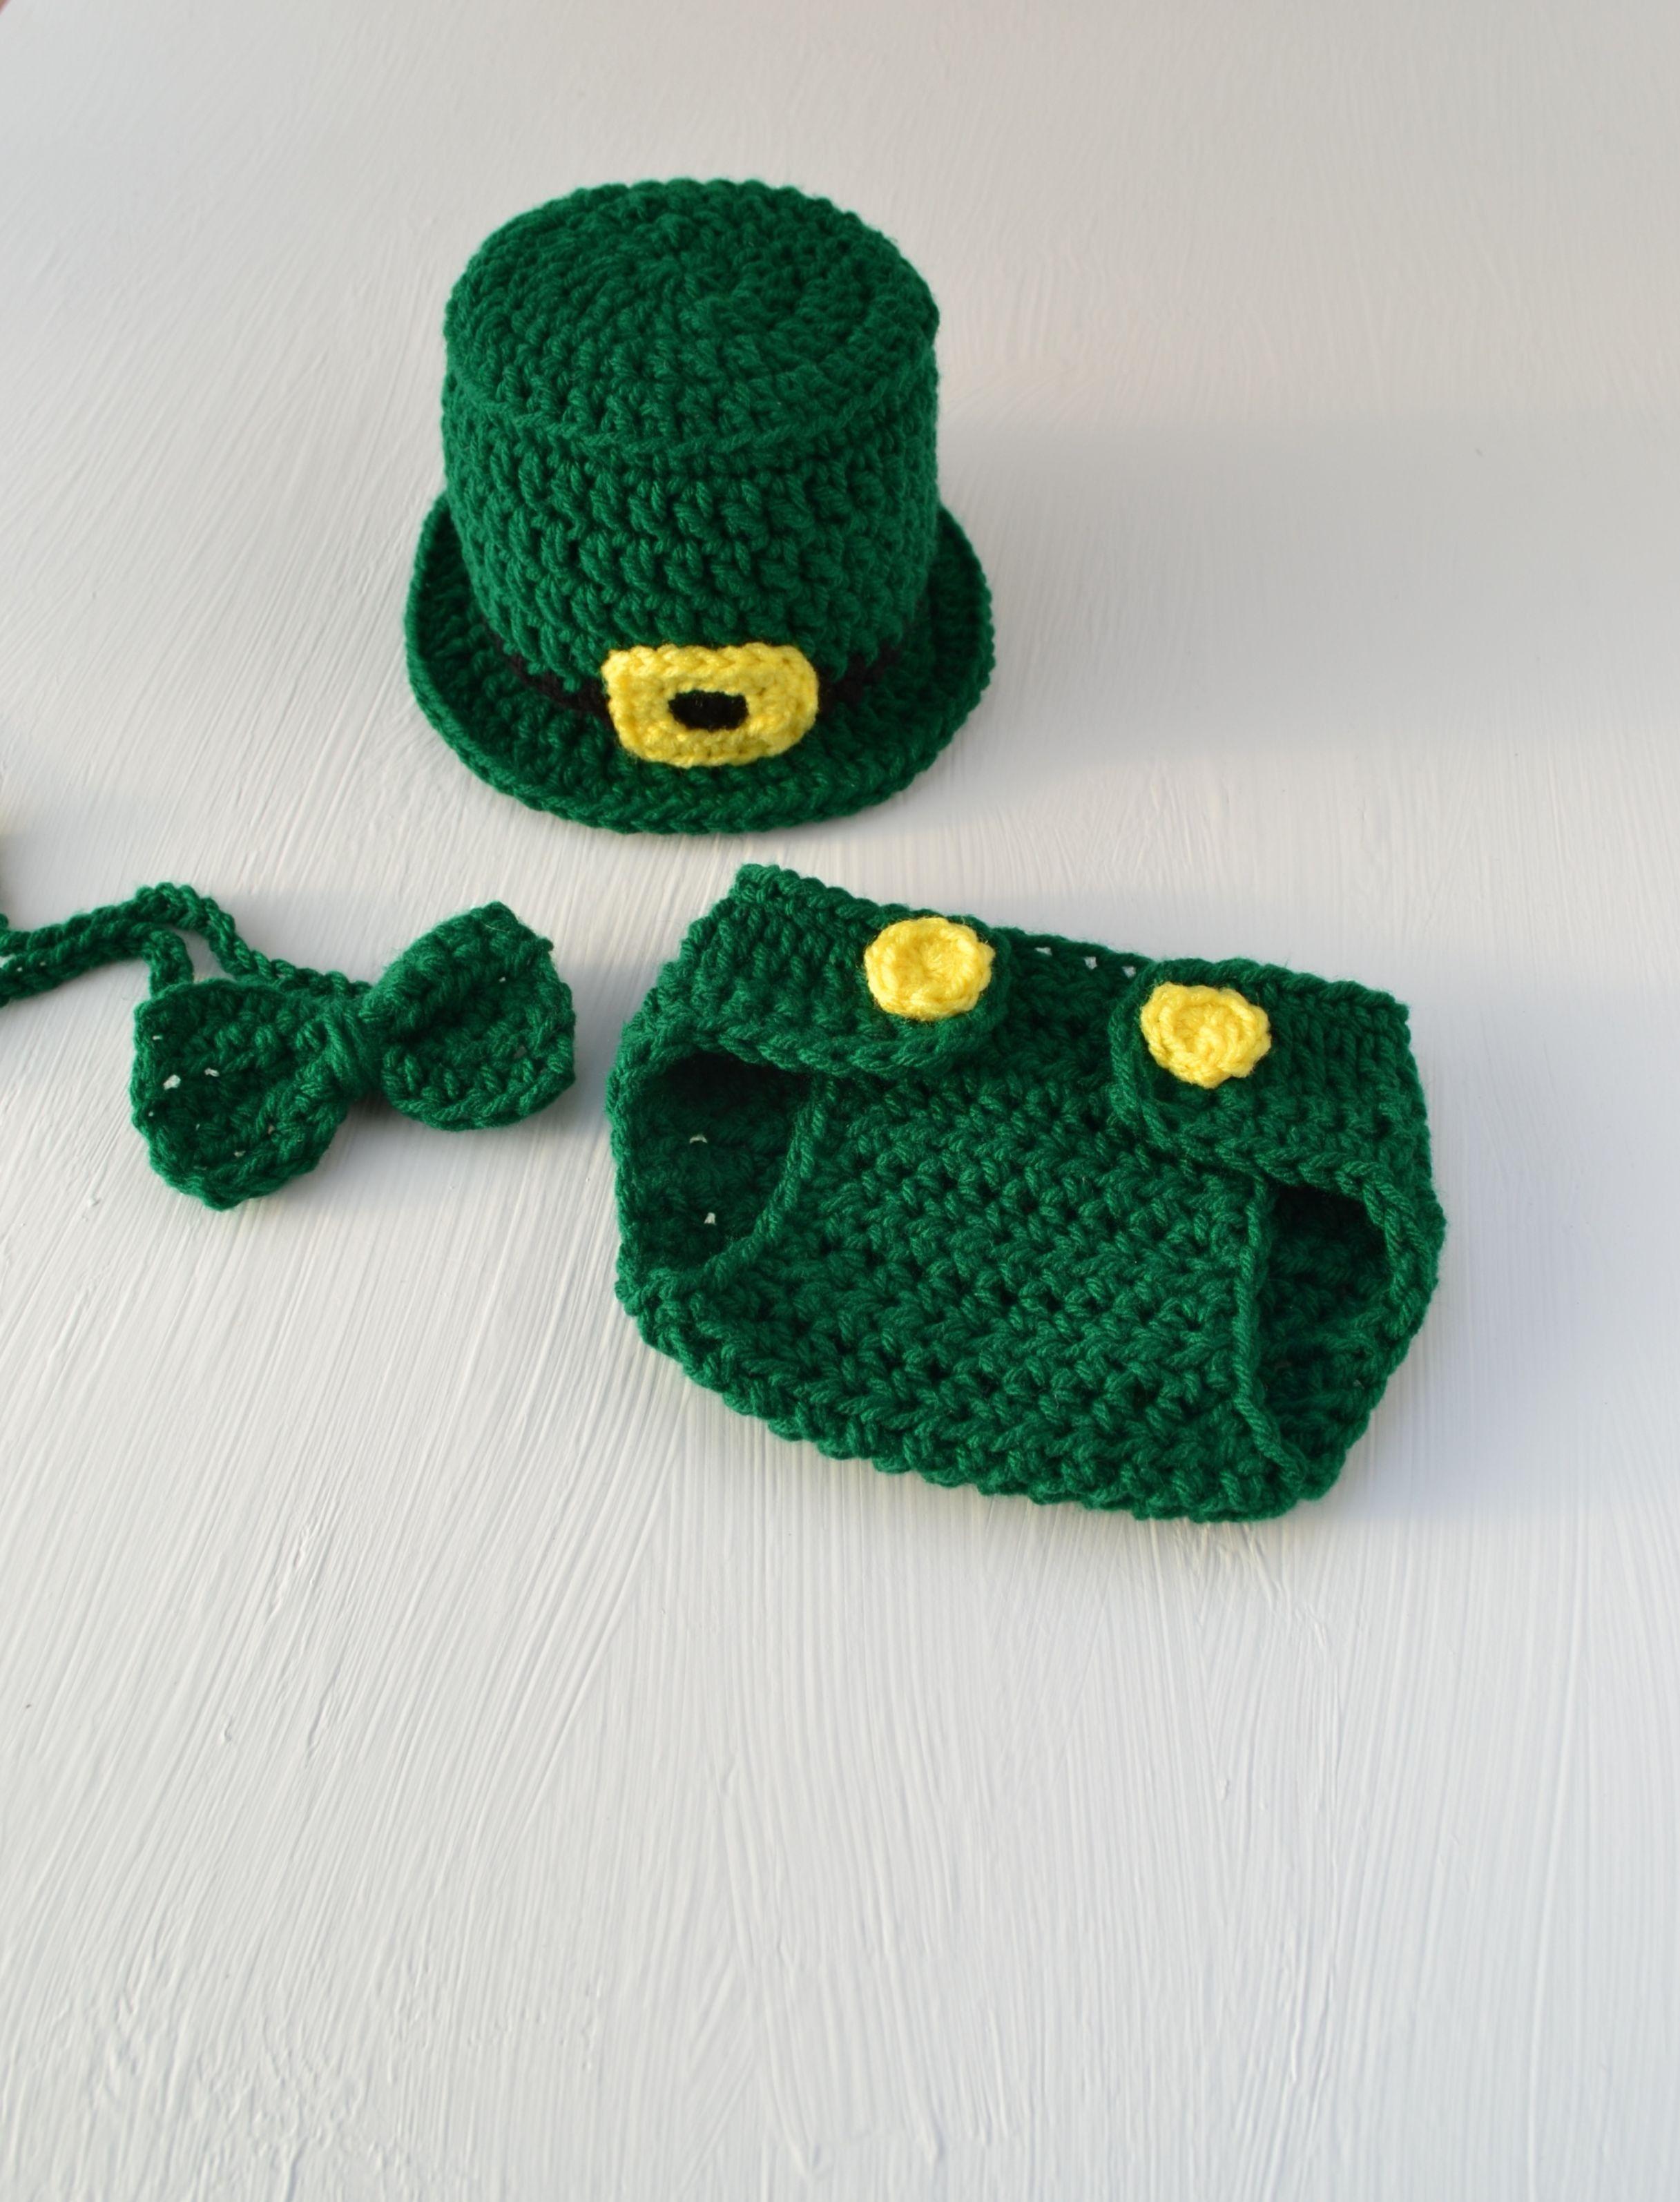 e93601a15 Crochet Baby St Patrick's Day Outfit Crochet Leprechaun Hat Diaper ...